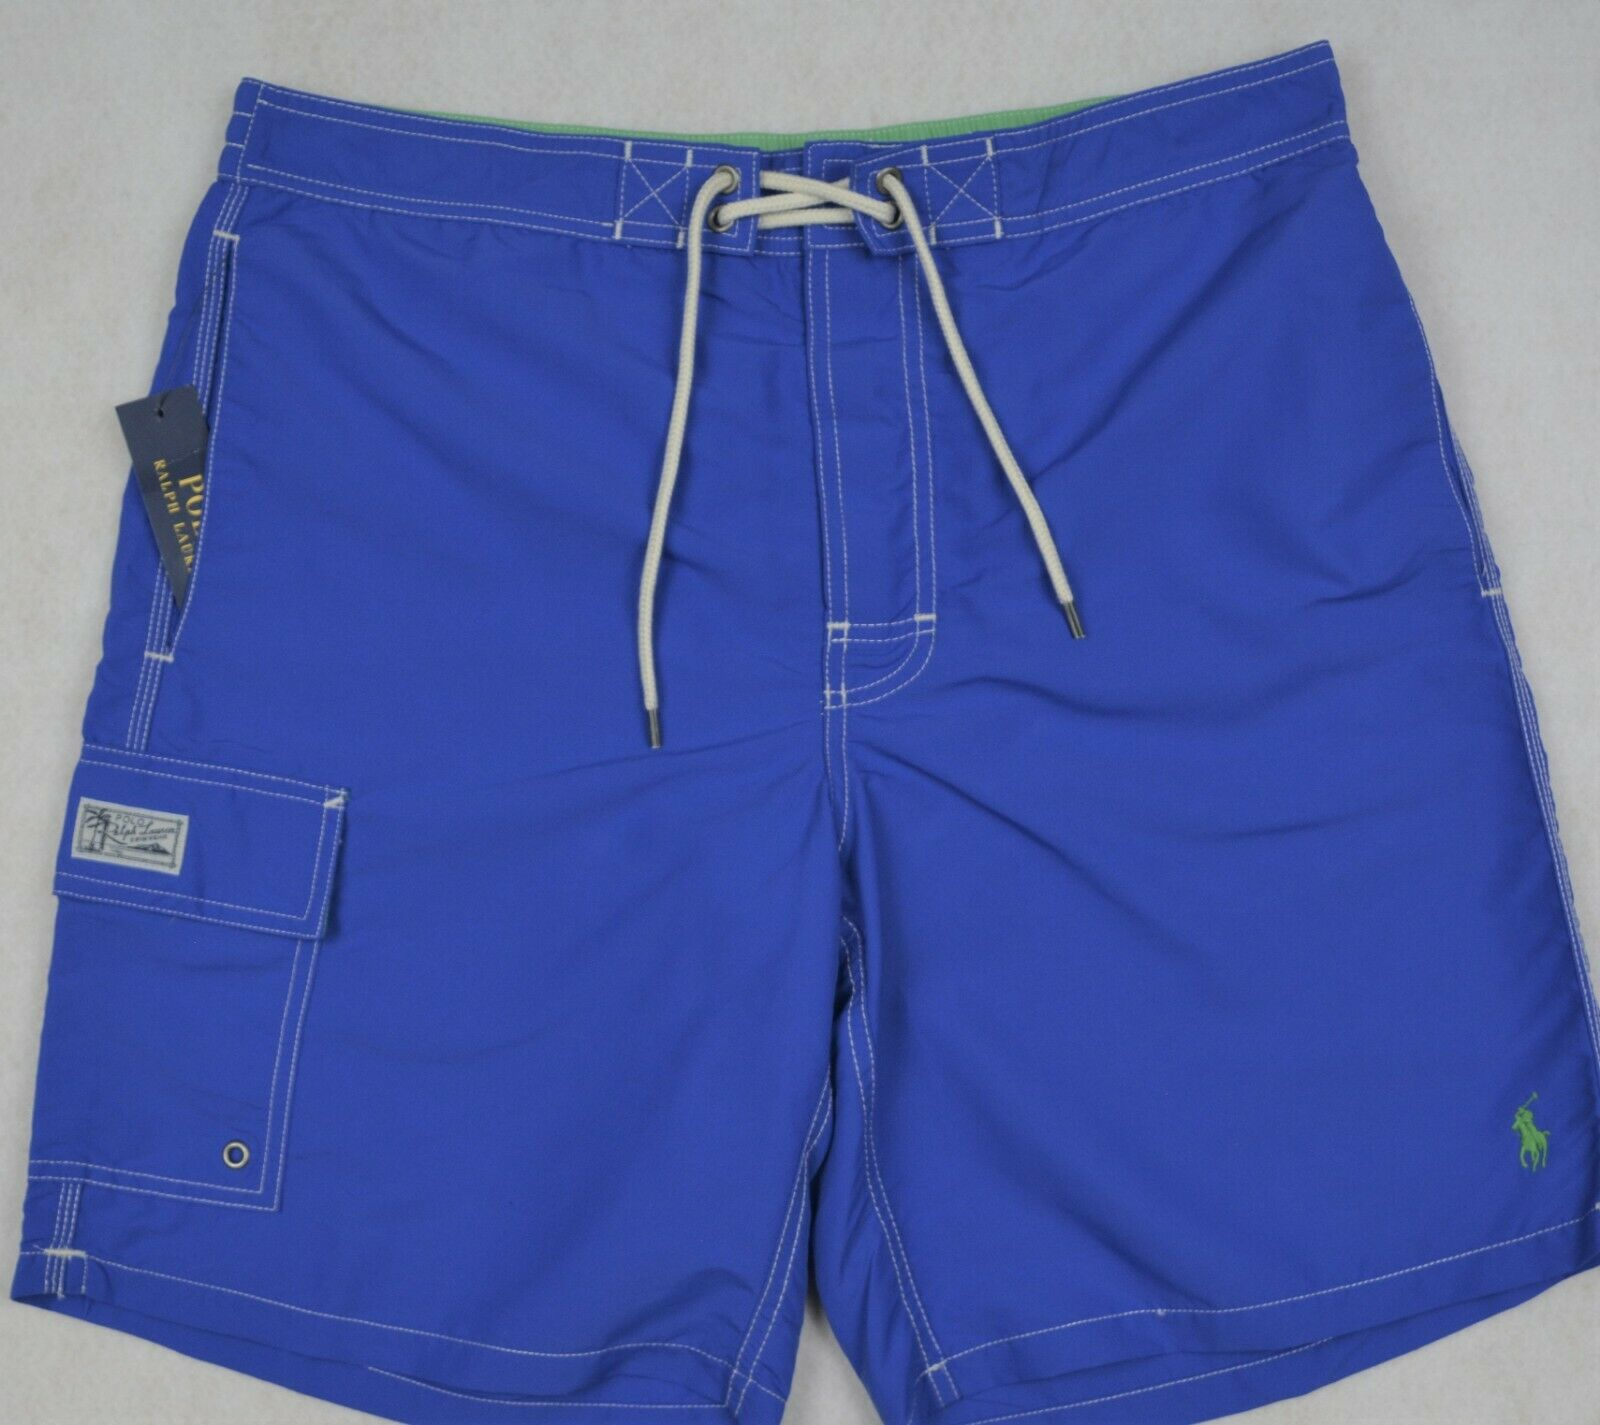 Polo Ralph Lauren Swim Trunks Briefs Shorts bluee Size XXL NWT